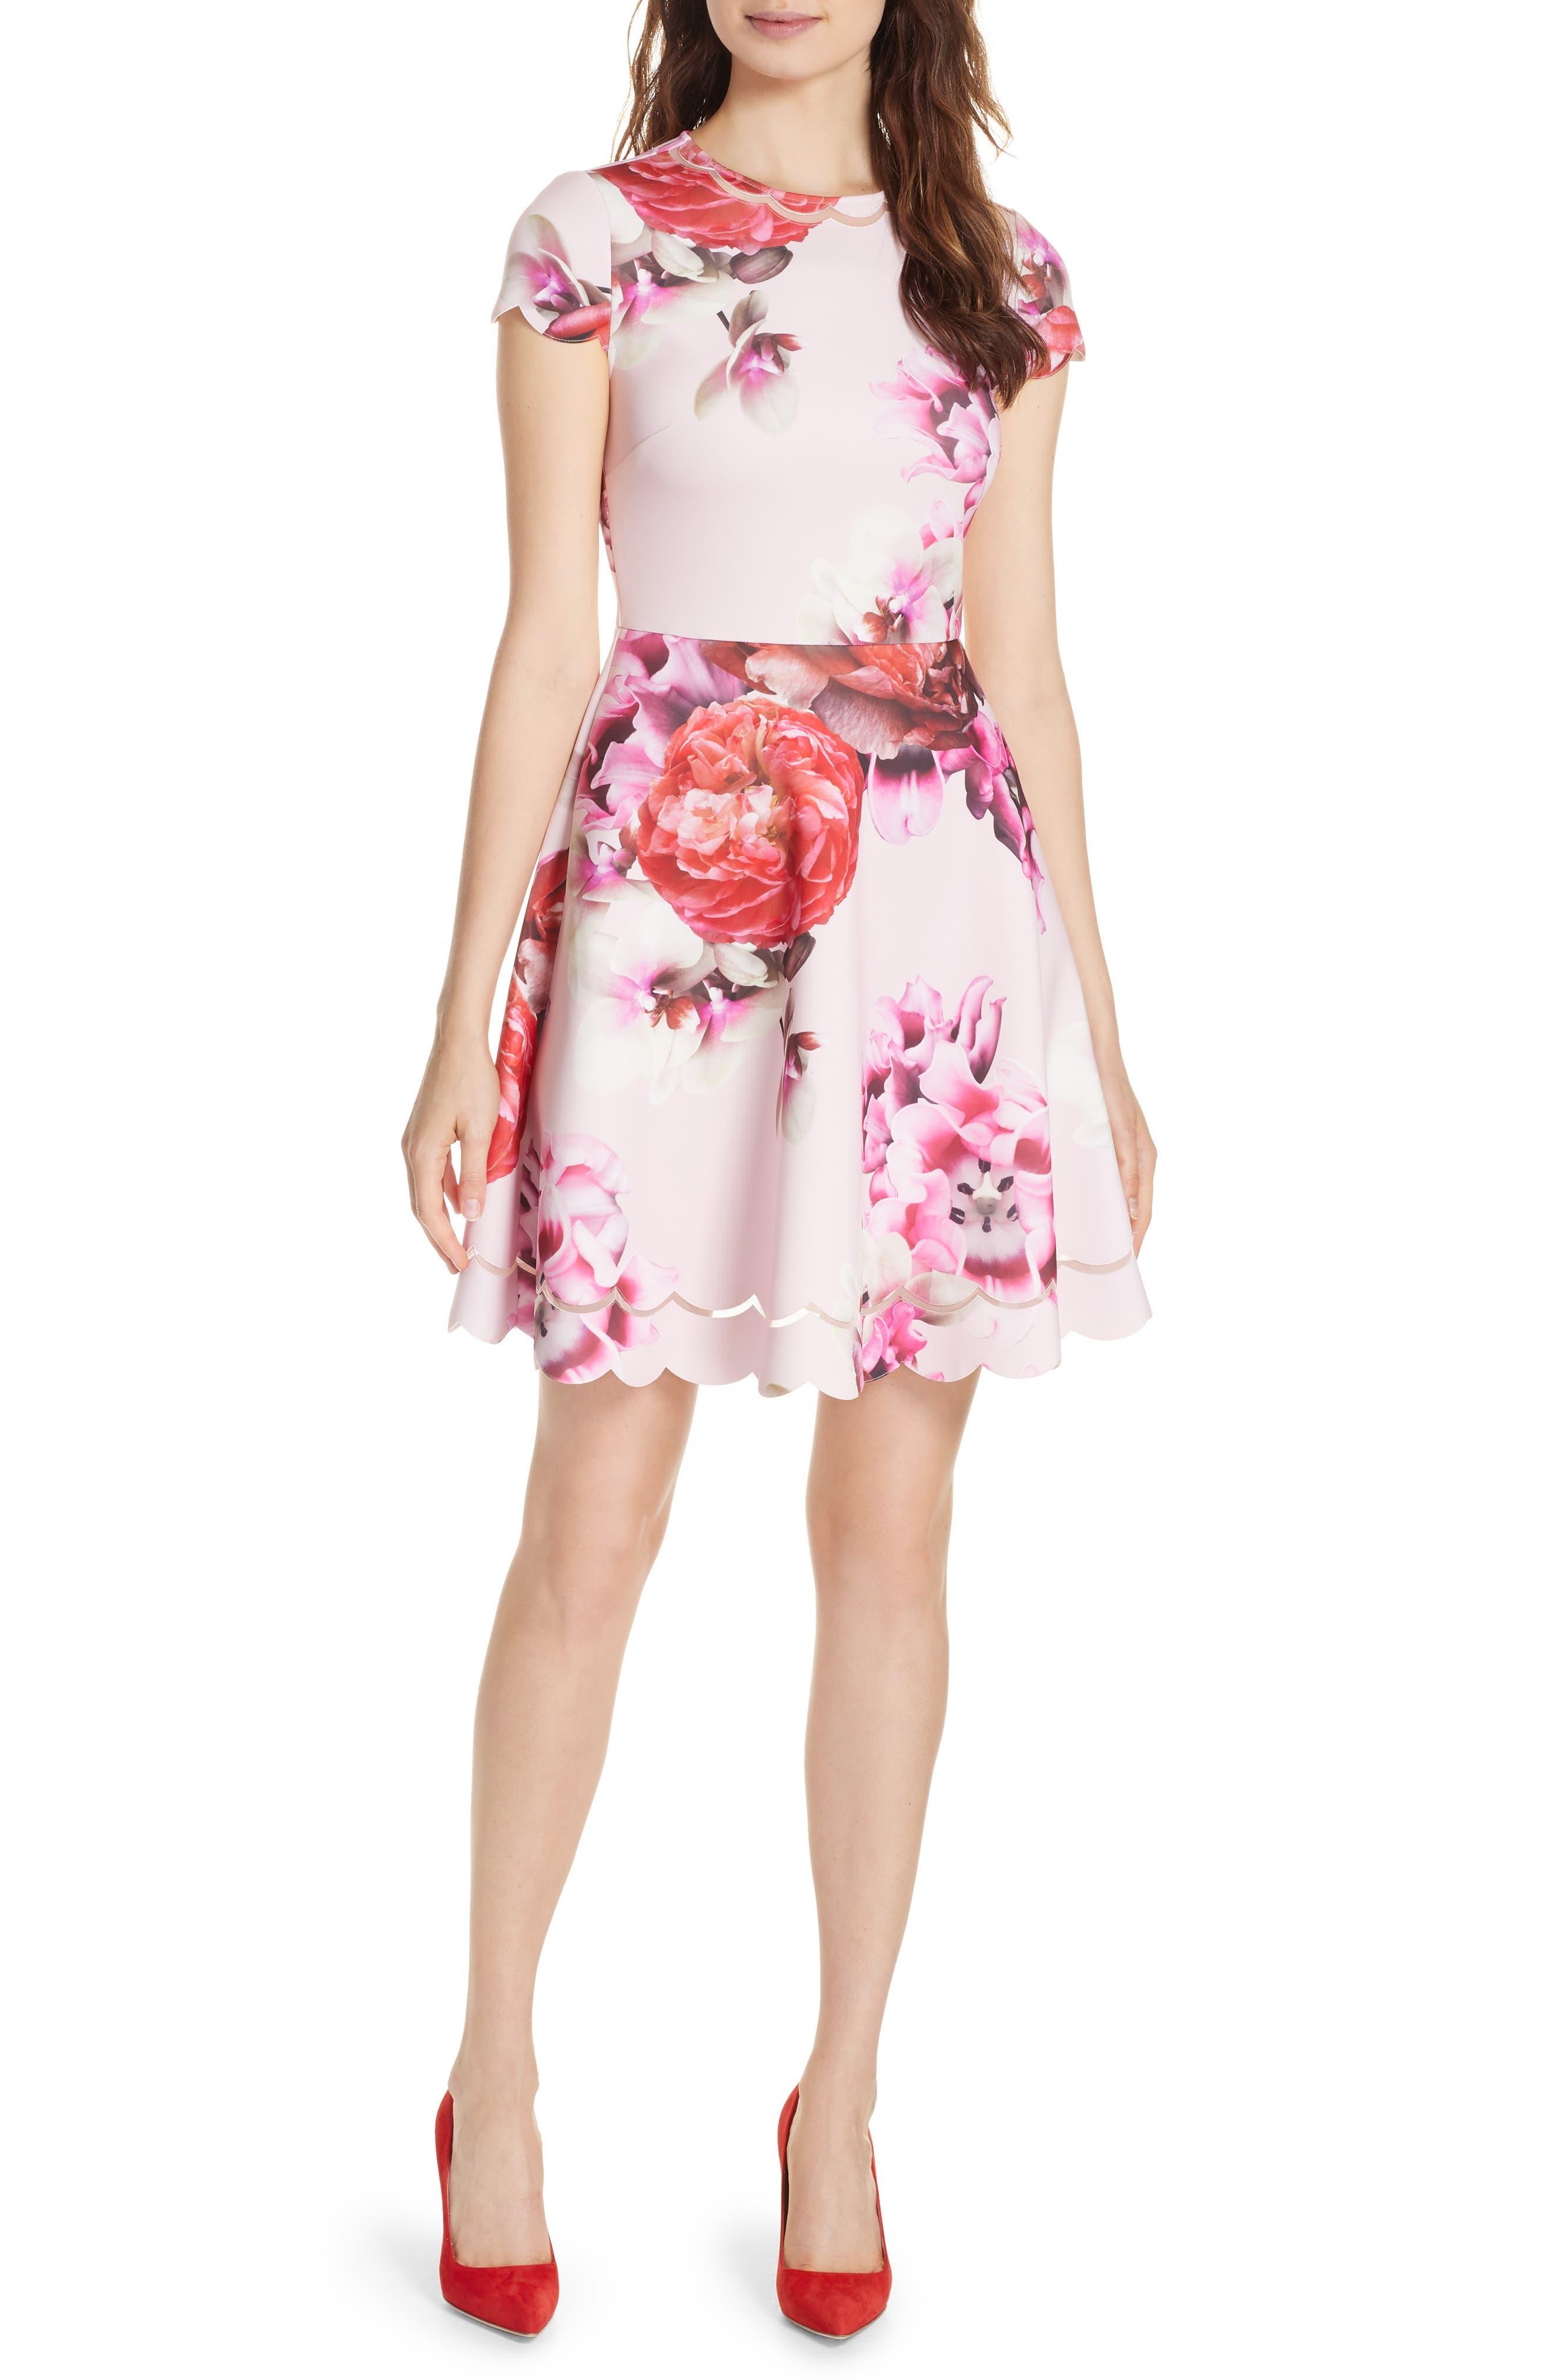 Seeana Splendour Skater Dress,                         Main,                         color, 683